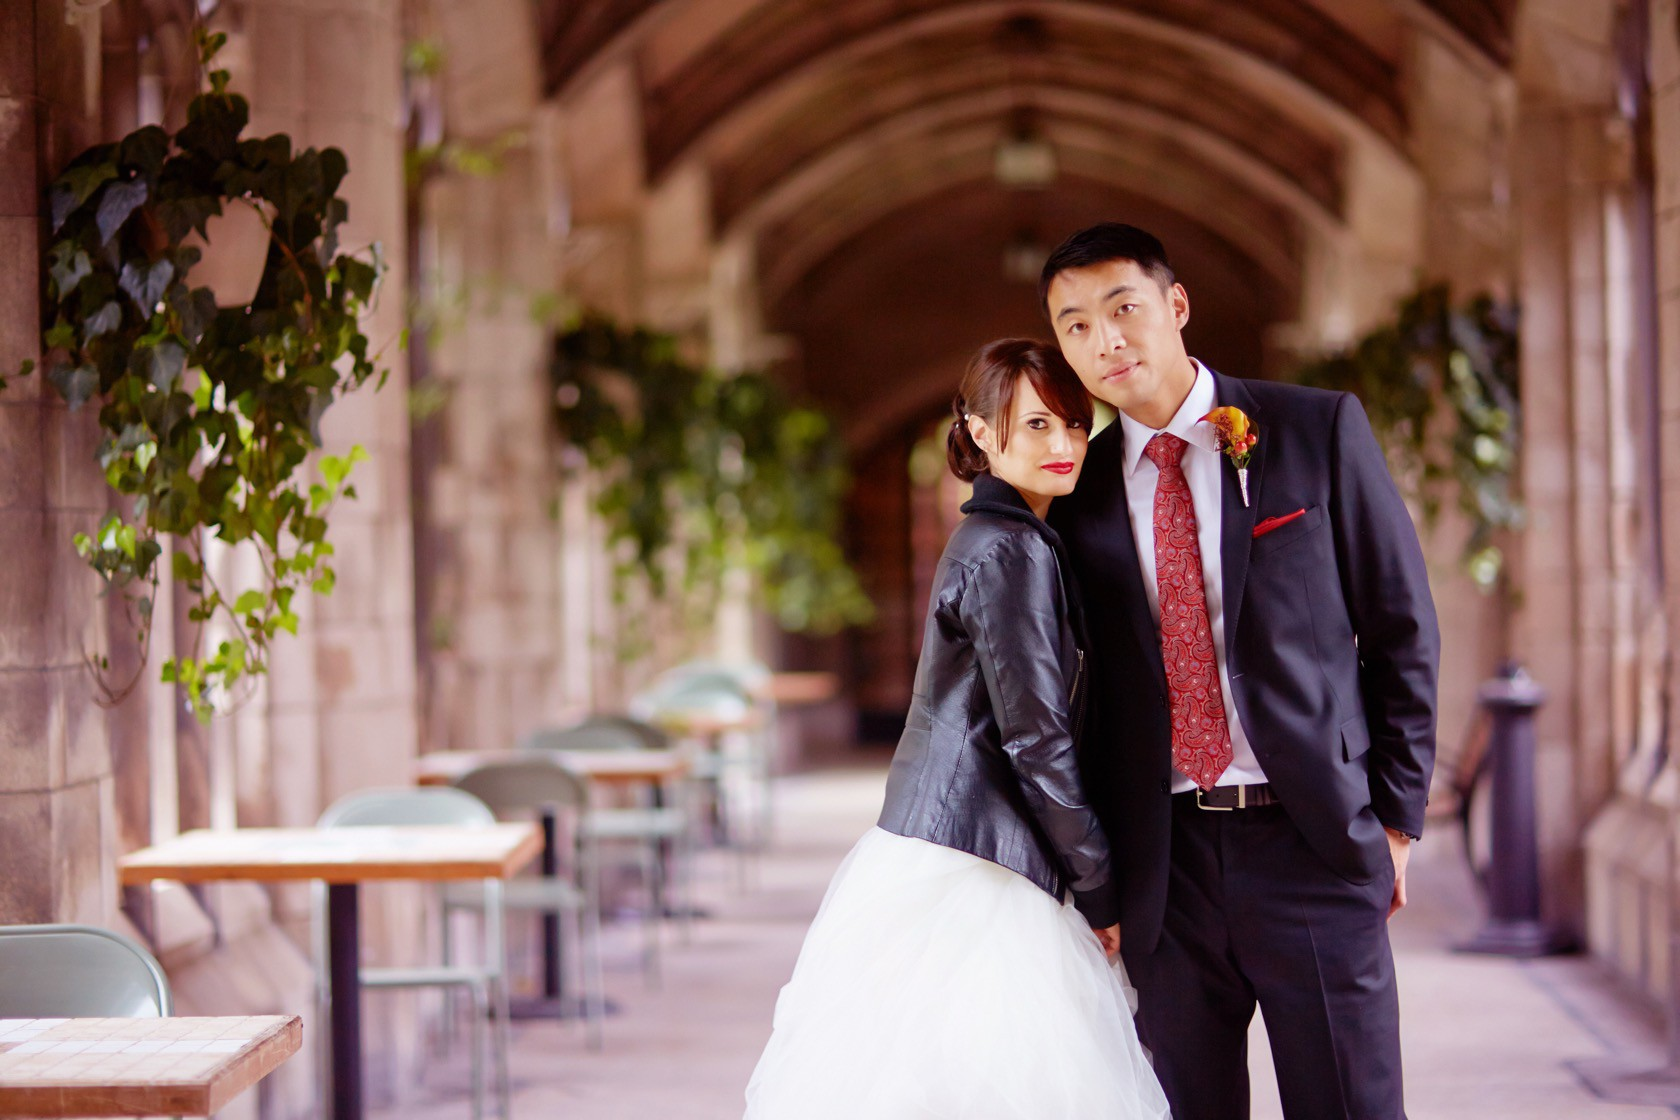 stephen sager photography 0010 fine art wedding photography